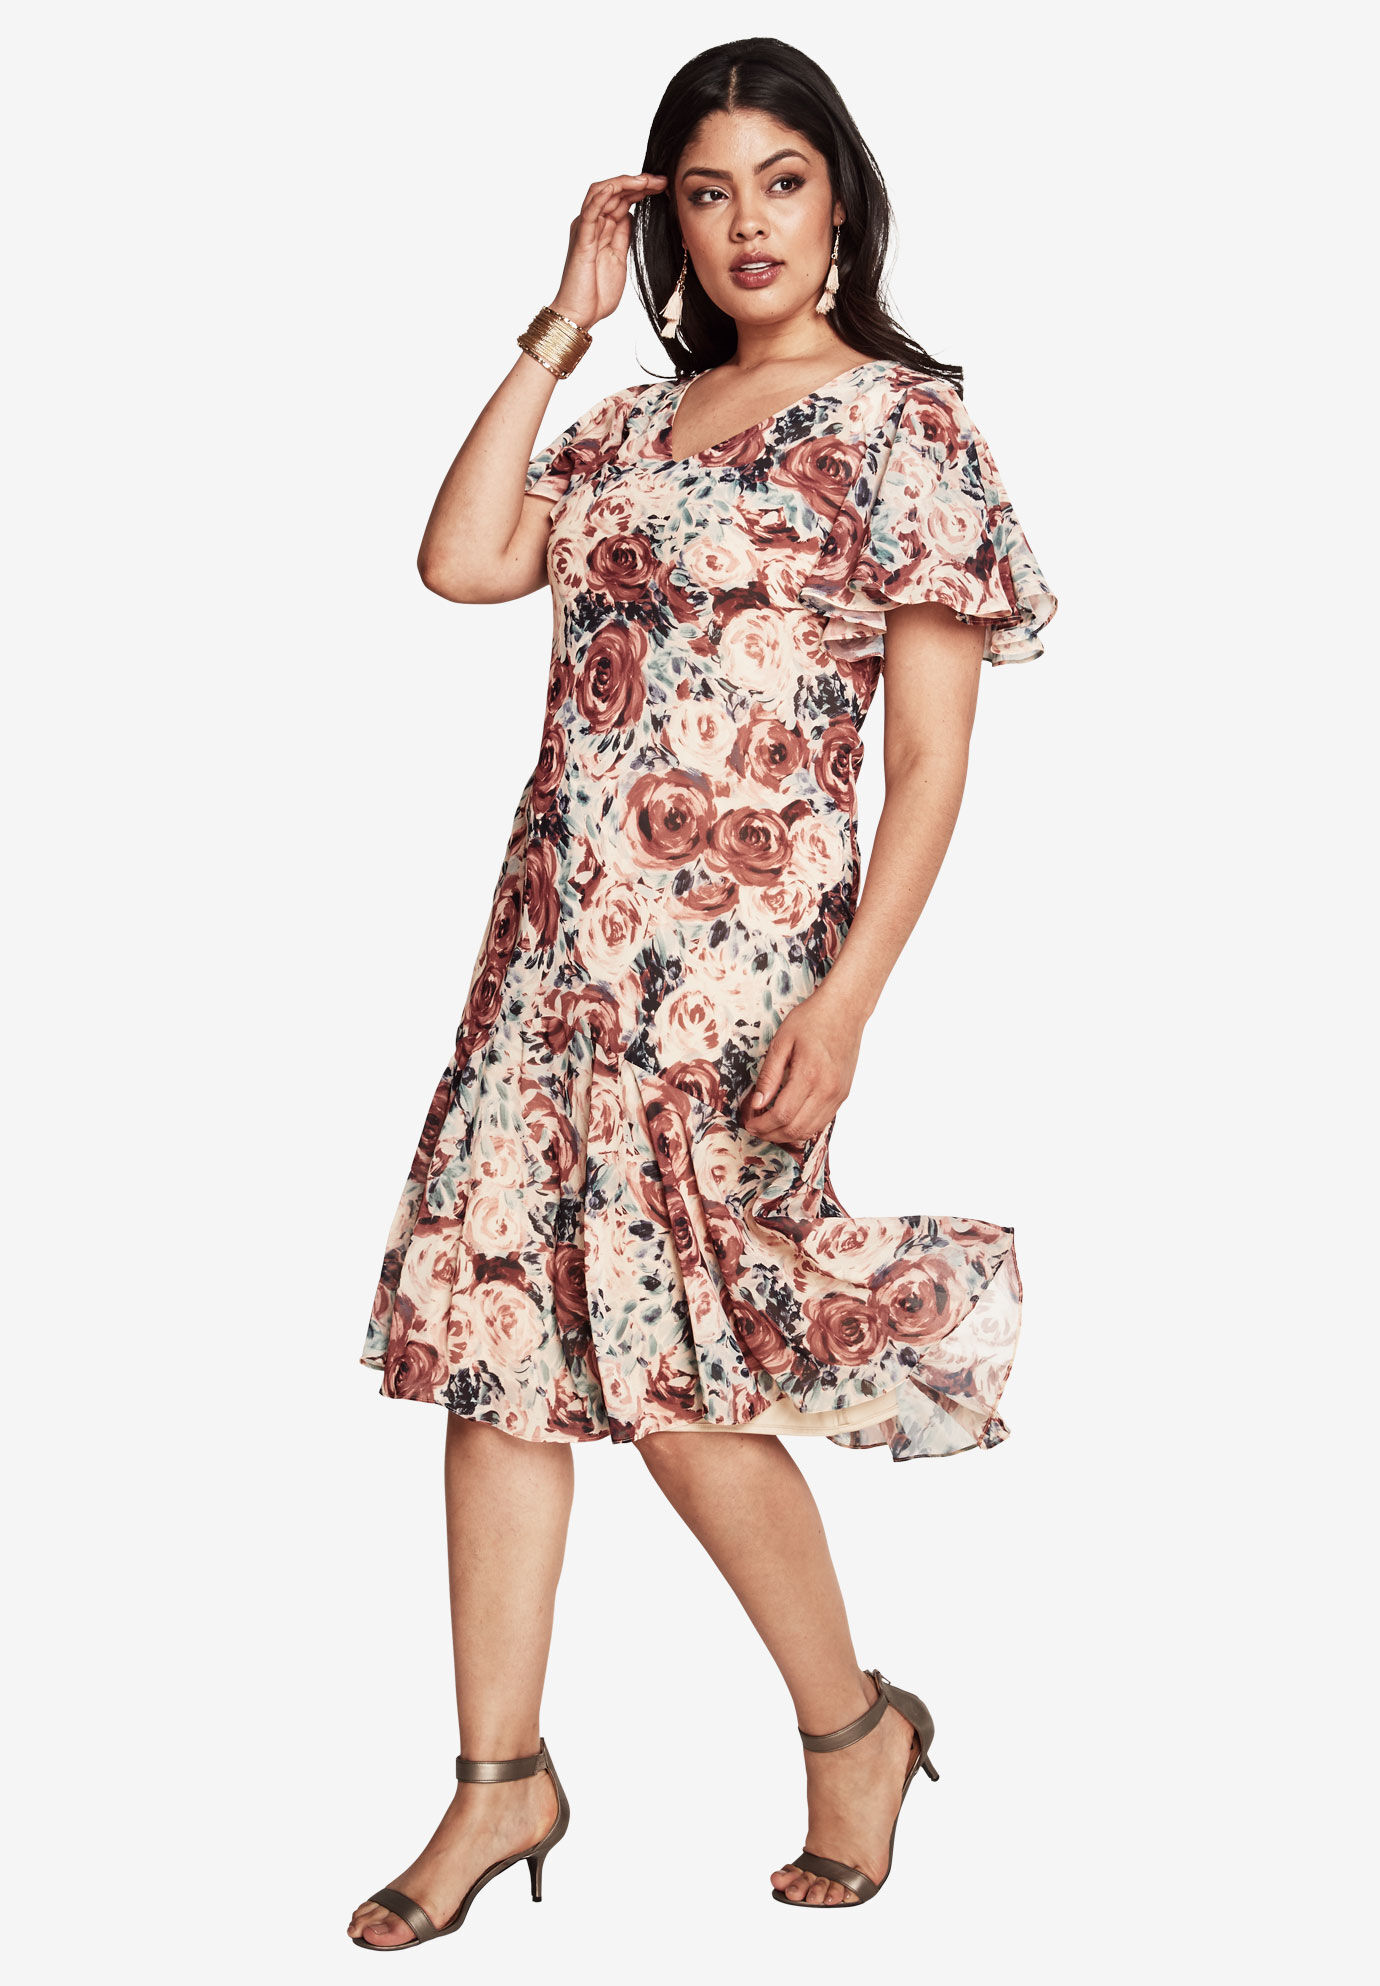 Dress On Sale 9.99